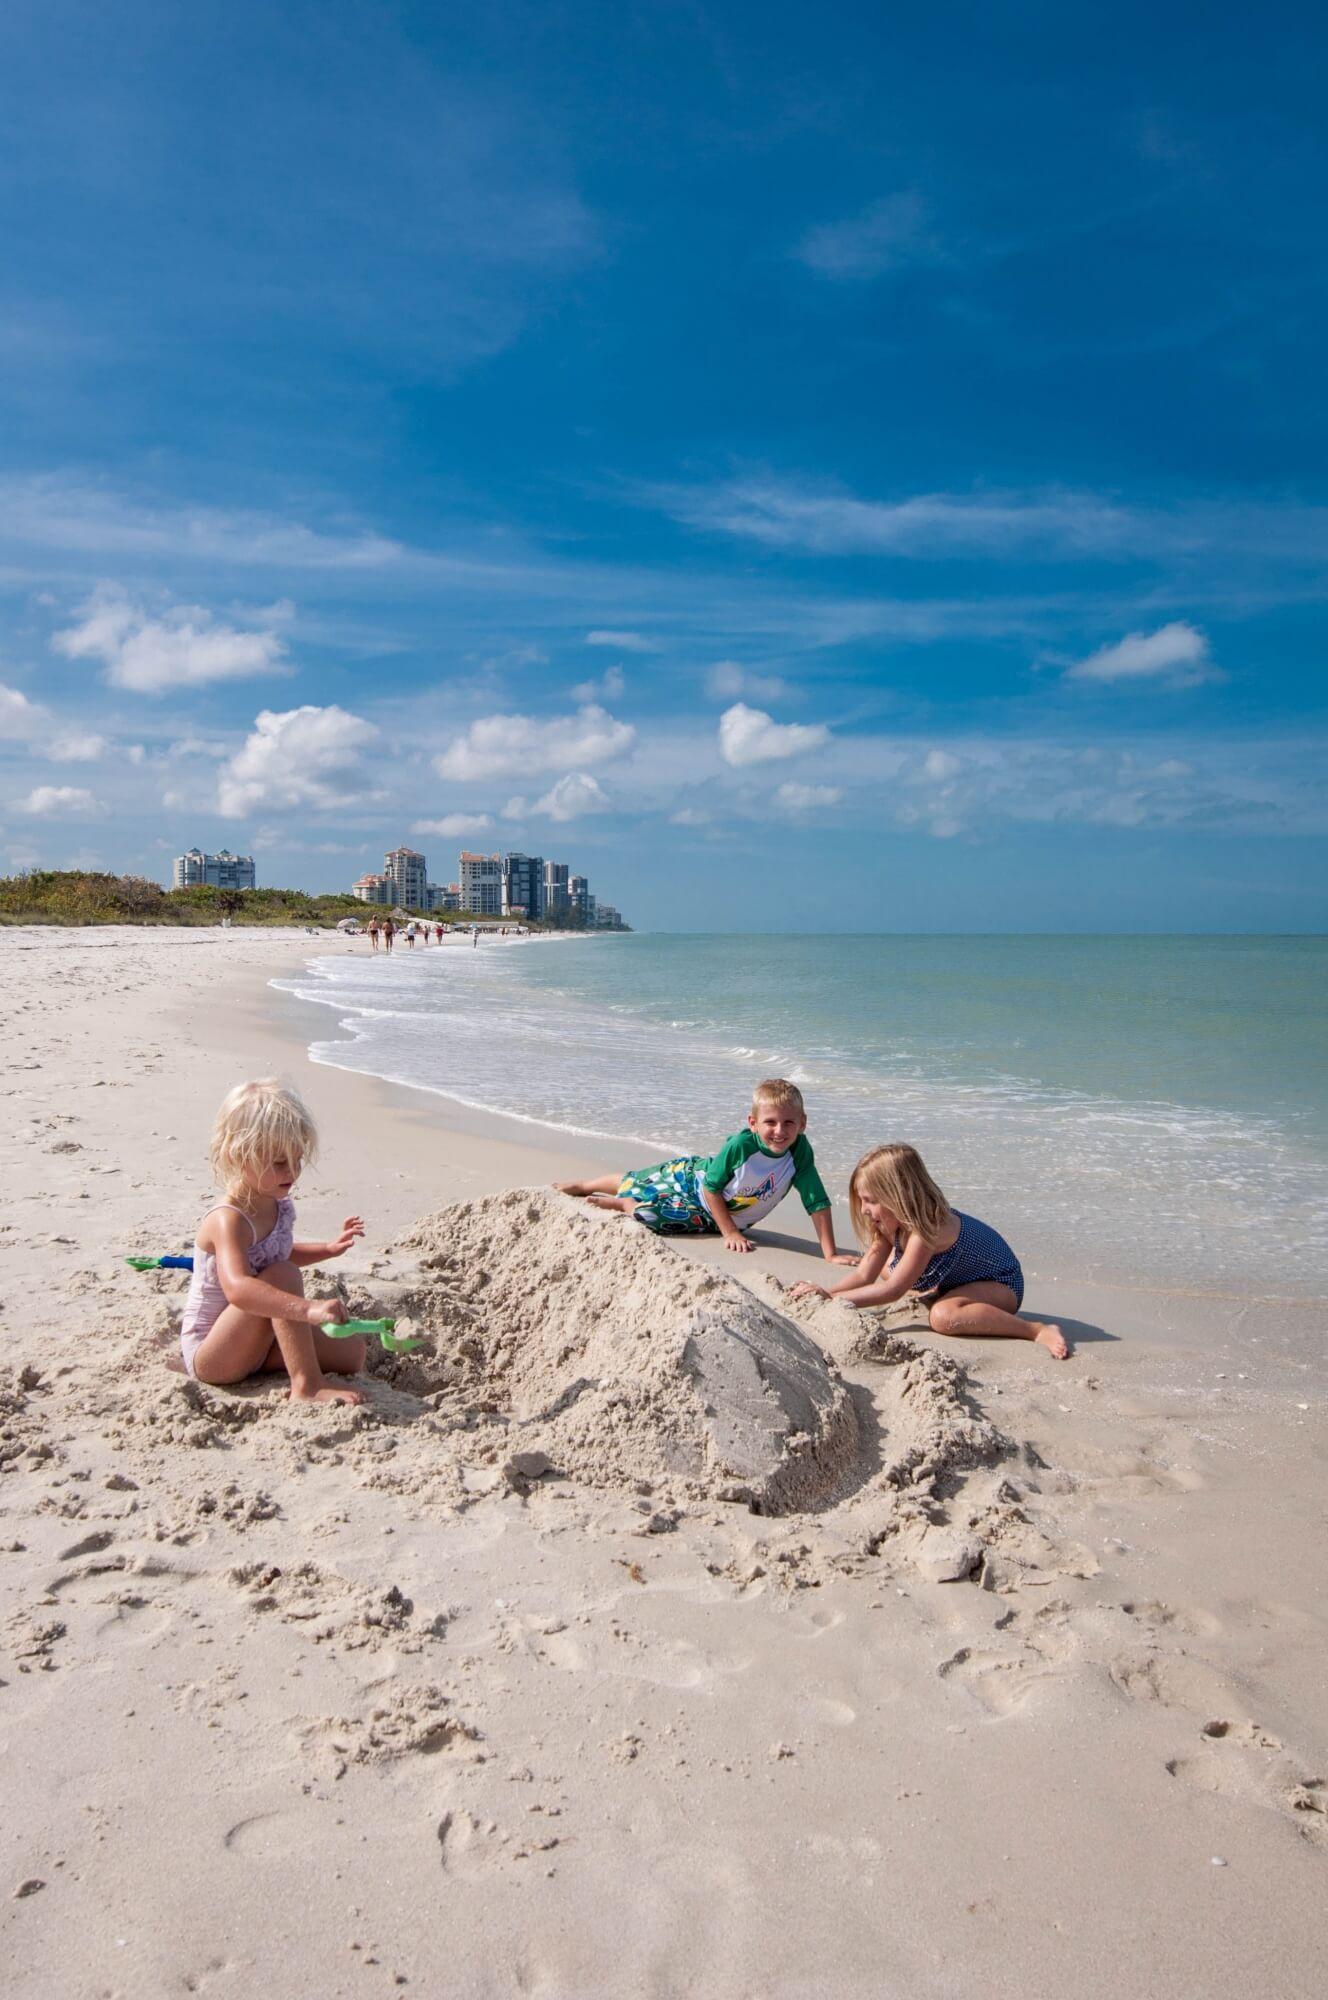 MustDo.com | Kids build a sandcastle in the white sand beach at Clam Pass Beach Naples Florida. Photo by Debi Pittman Wilkey.